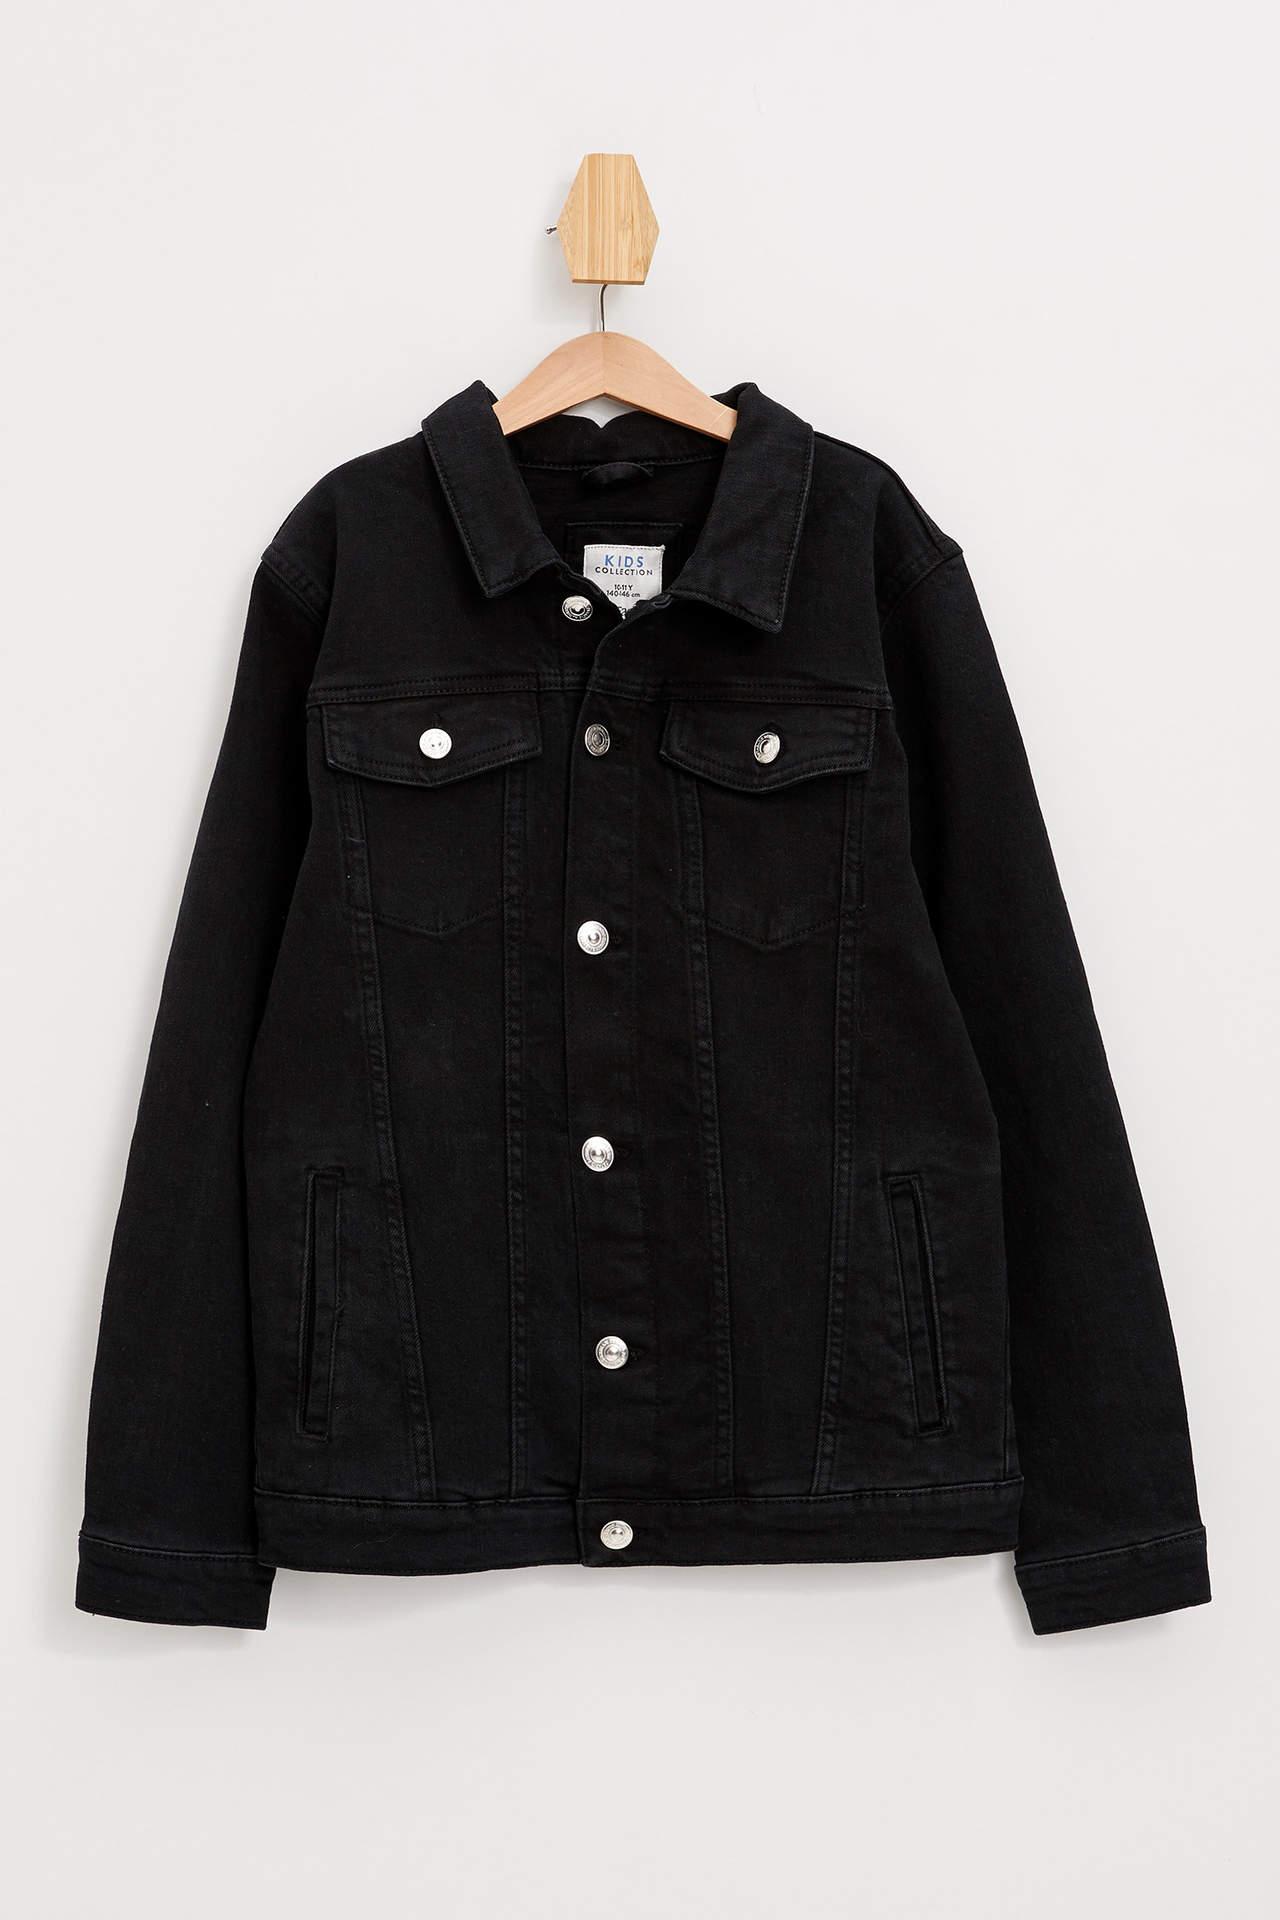 DeFacto Erkek Çocuk Jean Ceket Siyah male